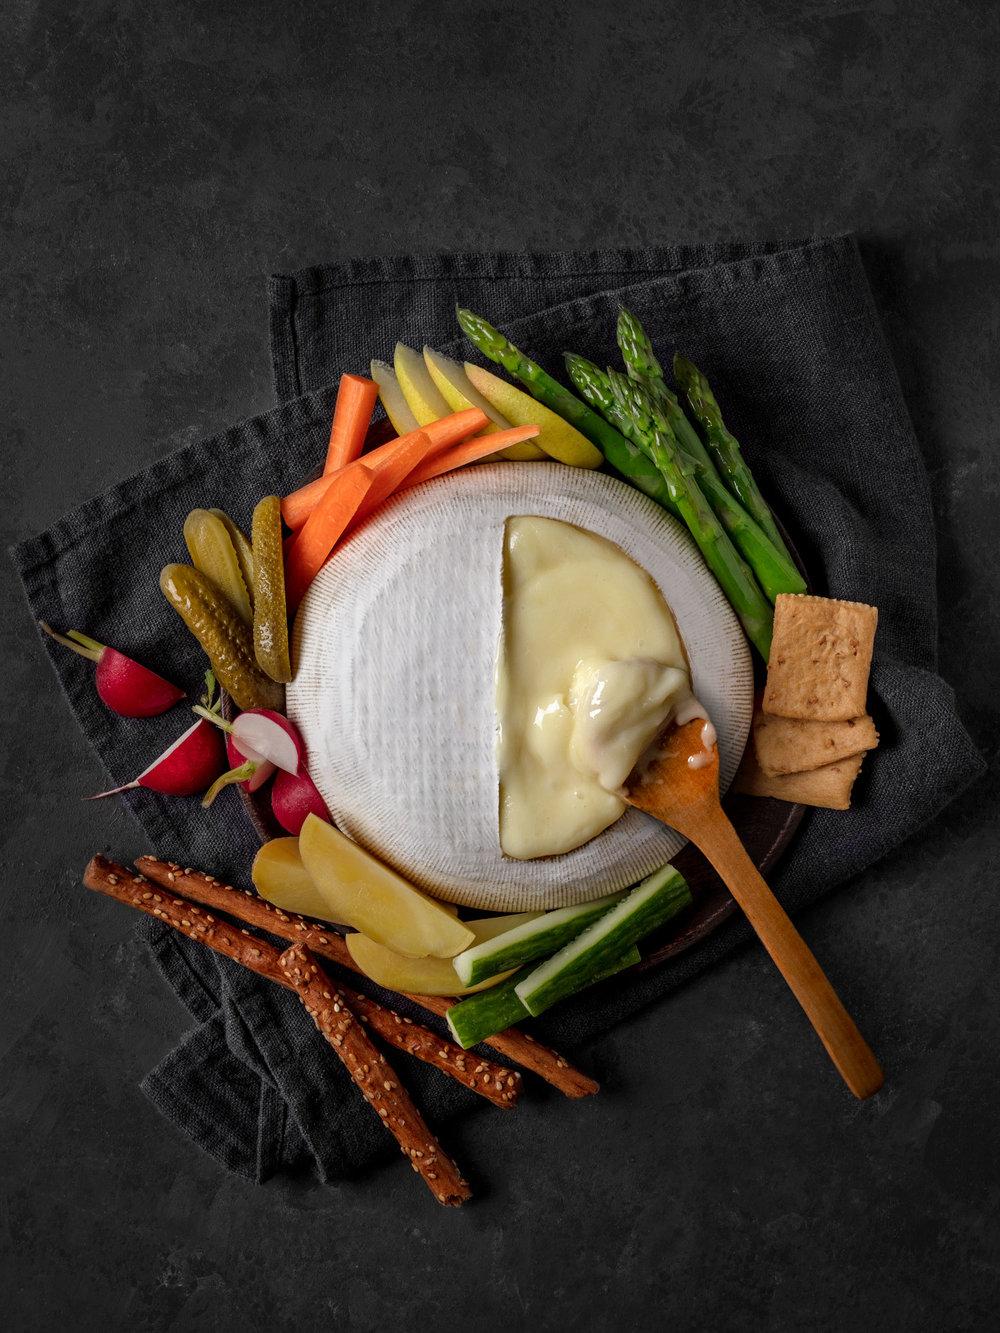 corina-landa-food-photography-fotografia-gastronomica-0185.jpg